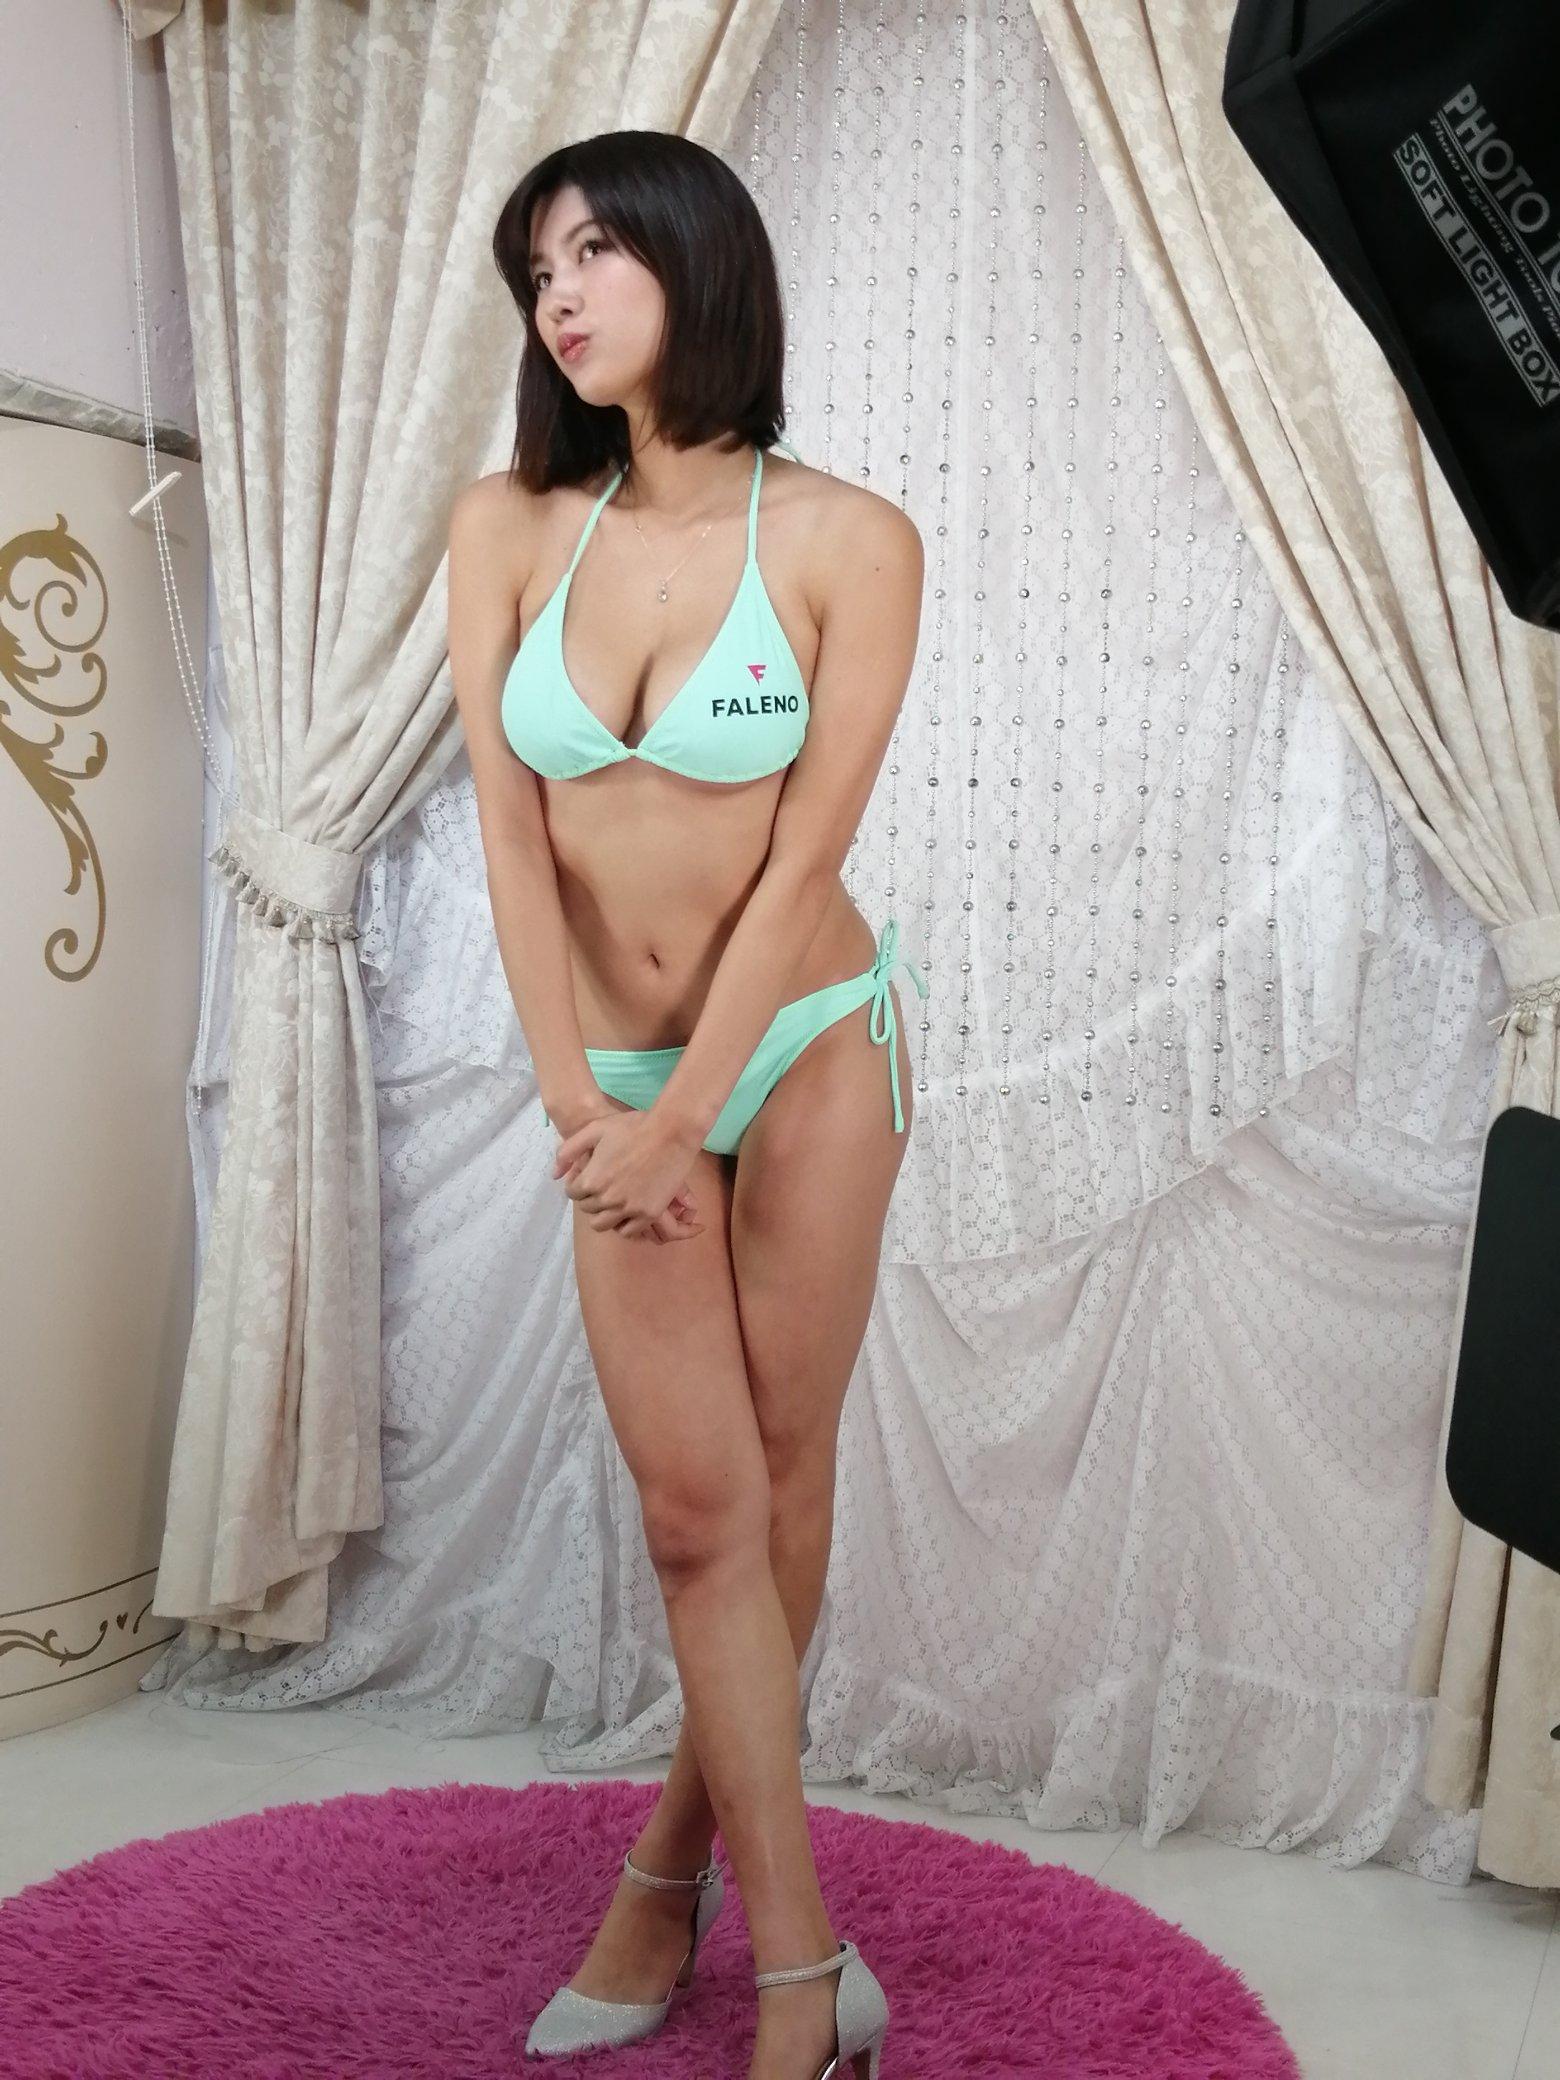 FALENOstars Mino Suzume 美乃 すずめ KANSAI WOMAN - ScanLover 2.0 - Discuss JAV